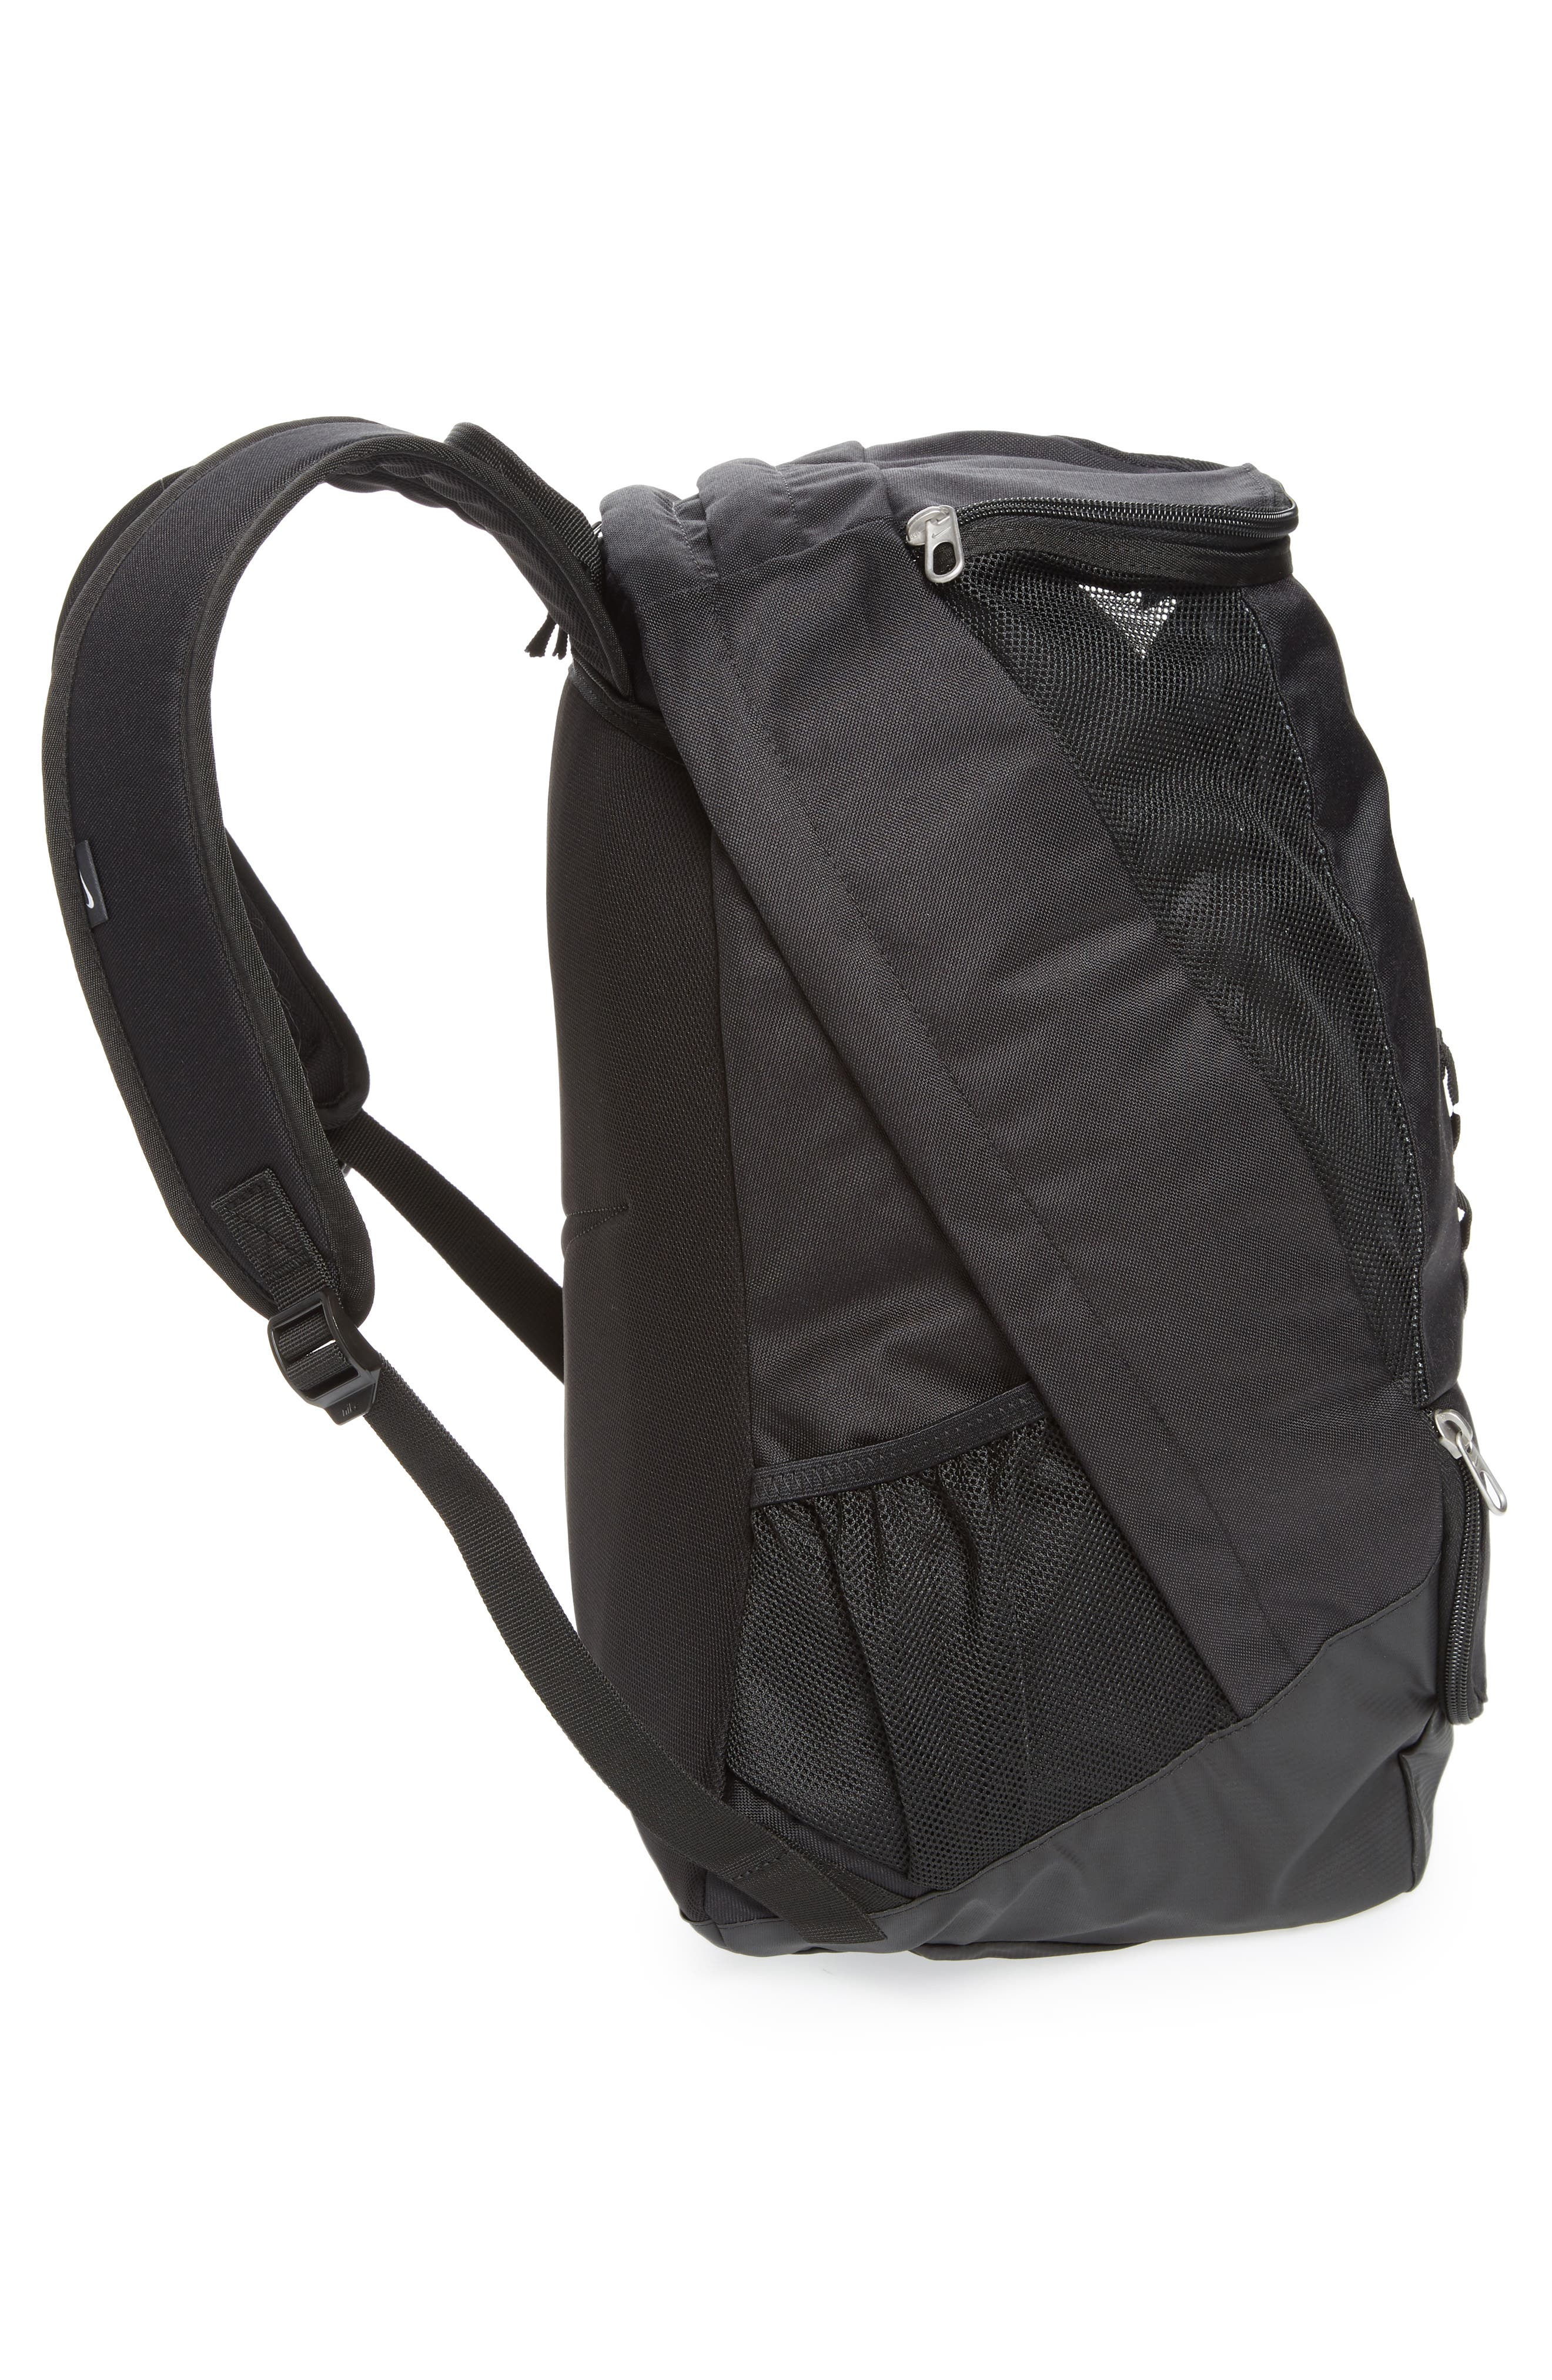 Club Team Backpack,                             Alternate thumbnail 5, color,                             010